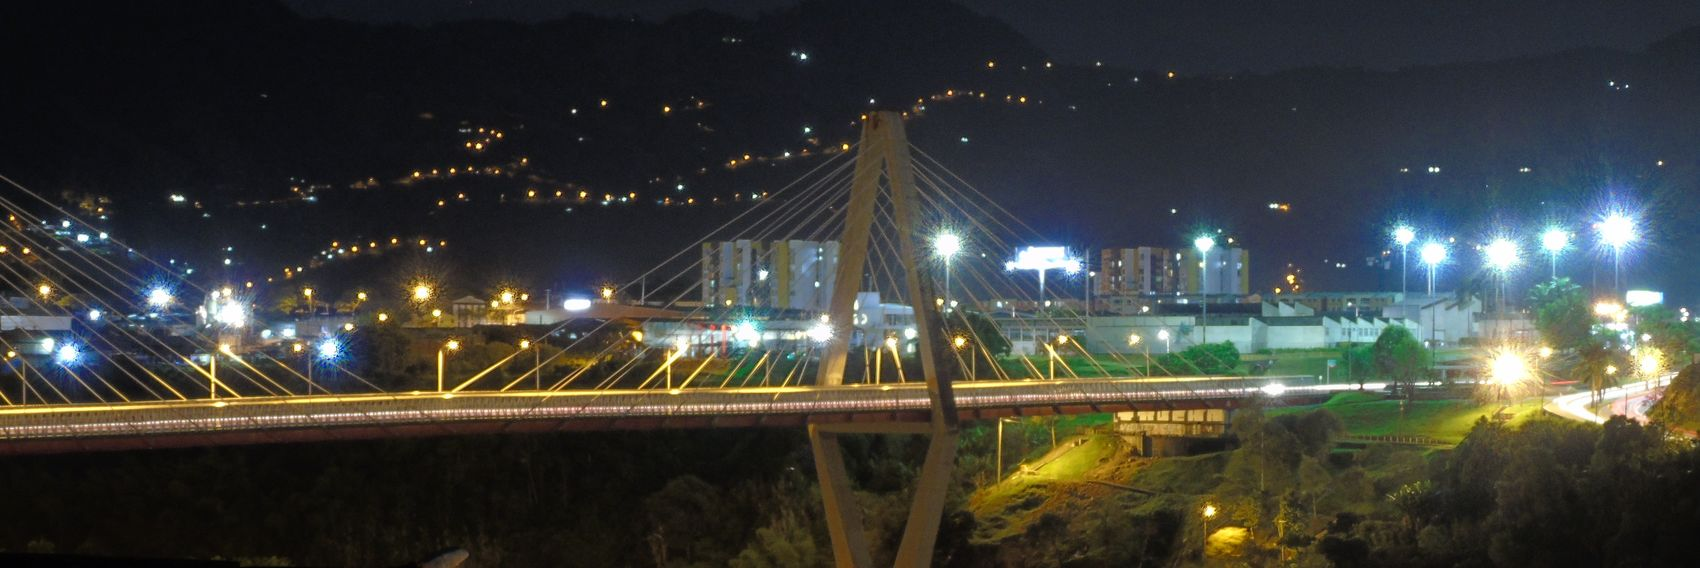 Viaducto César Gaviria Trujillo, Pereira, Risaralda, Colombia Bridge City Life Colombia DSC H400 Engineering Illuminated Night Outdoors Pereira Remote Risaralda Sky